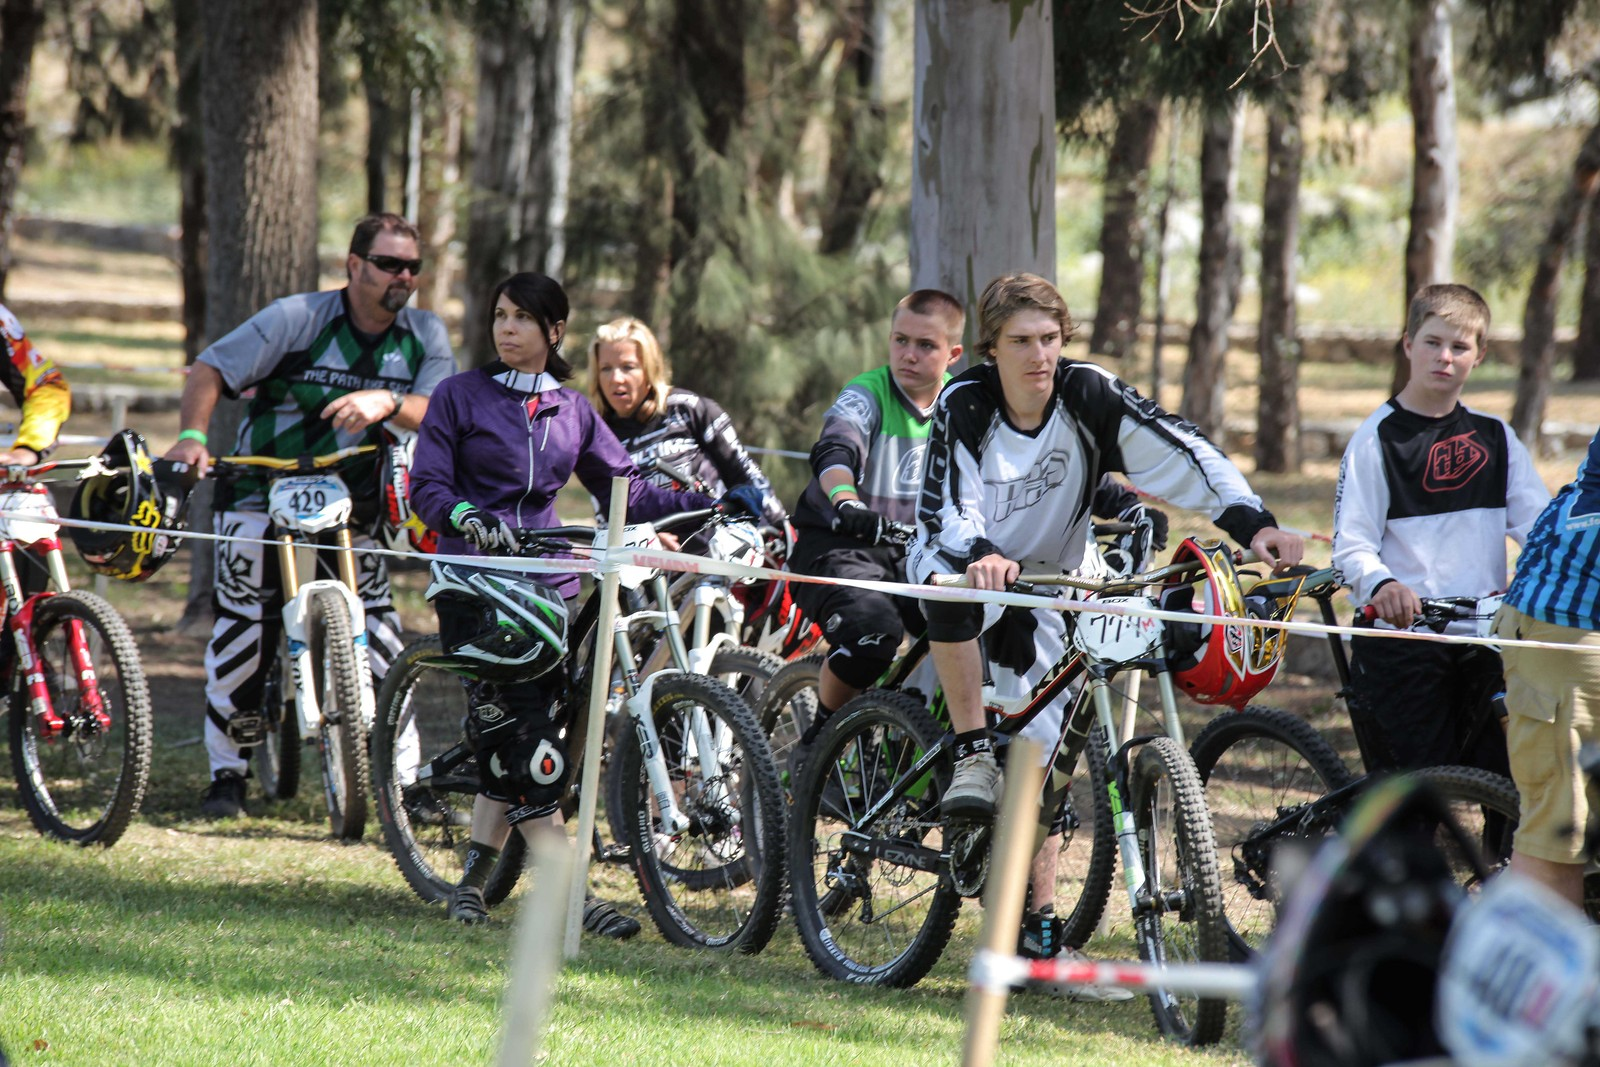 IMG 3206 - GnarHuck - Mountain Biking Pictures - Vital MTB